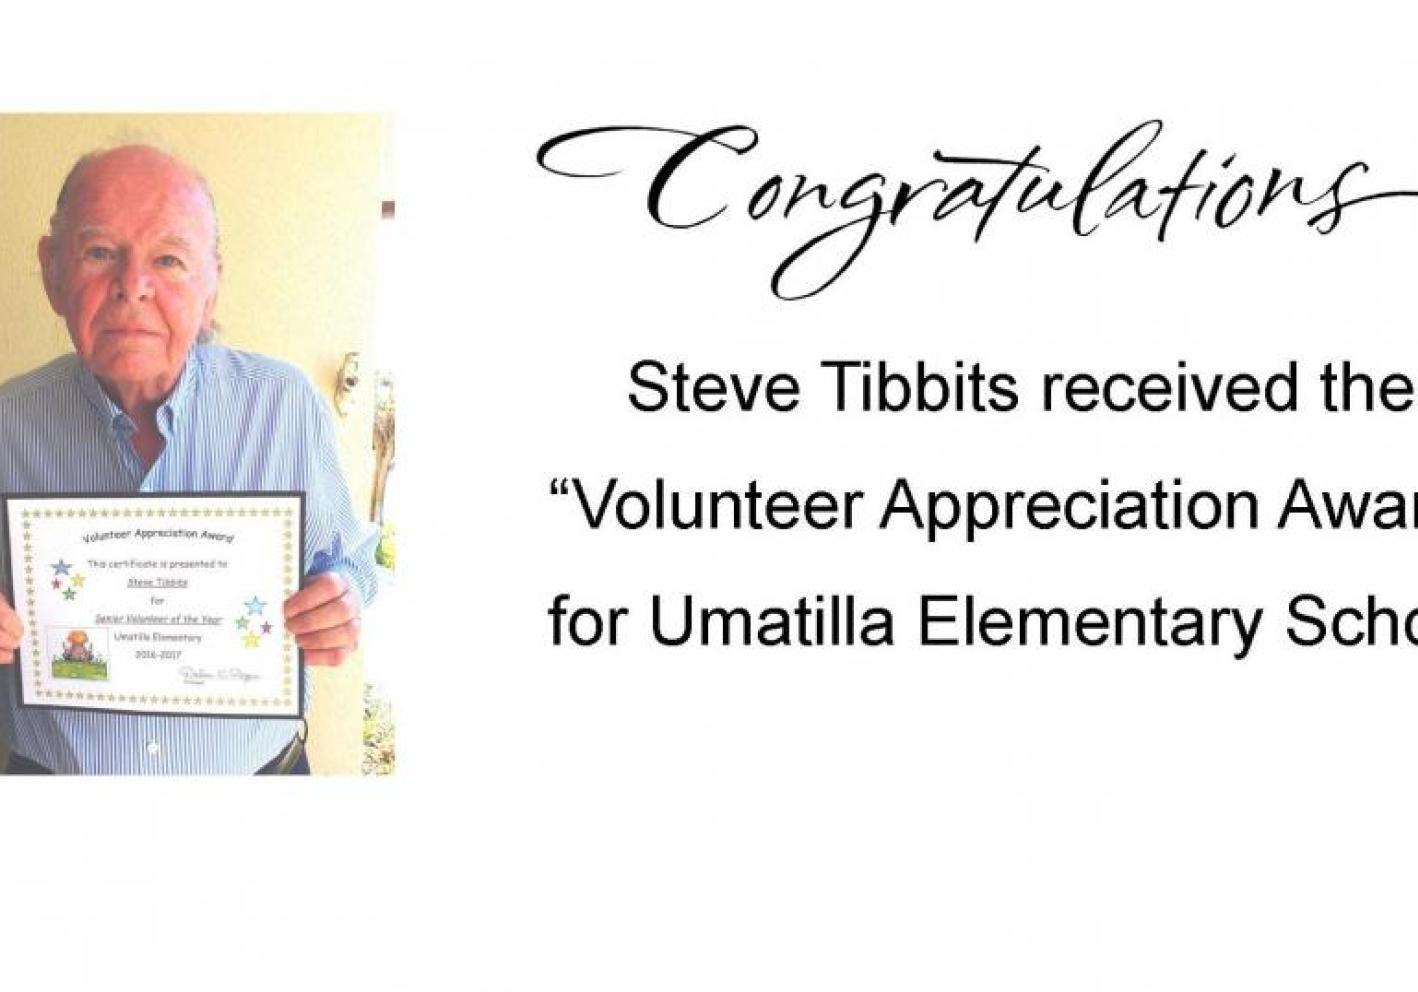 Volunteer Appreciation Award